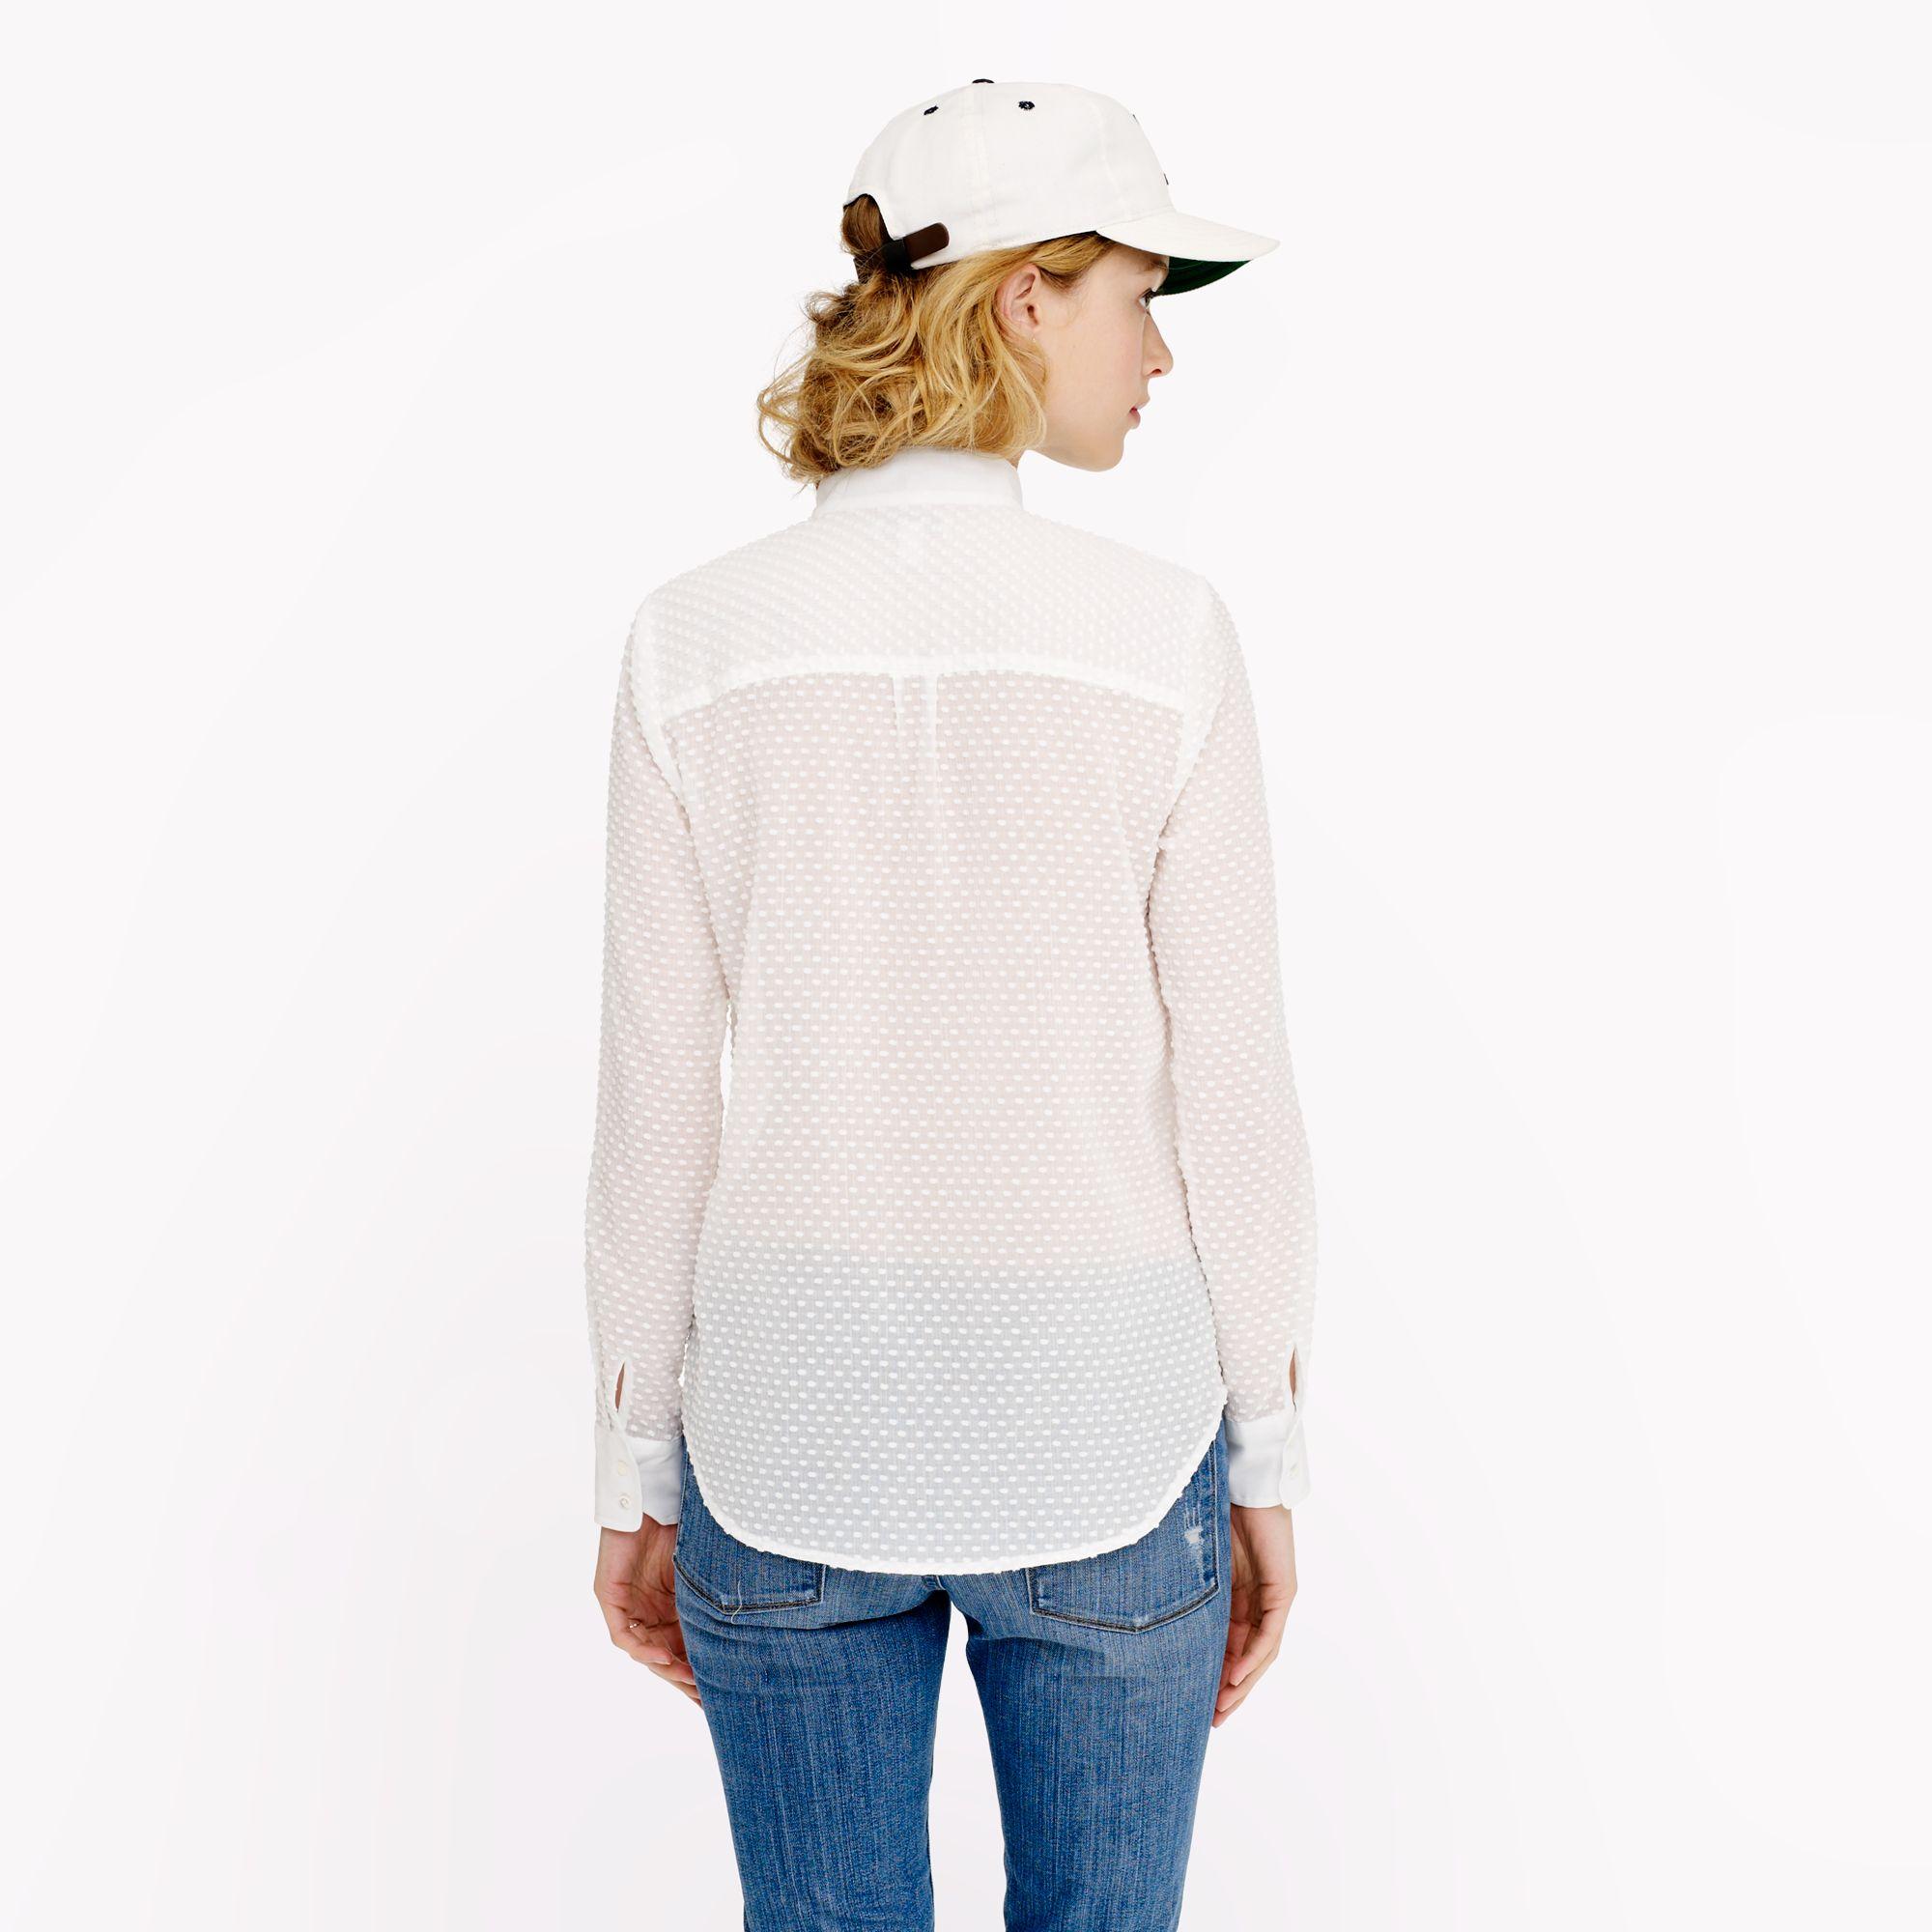 29073dbef786ec J.Crew Swiss Dot Tuxedo Shirt in White - Lyst